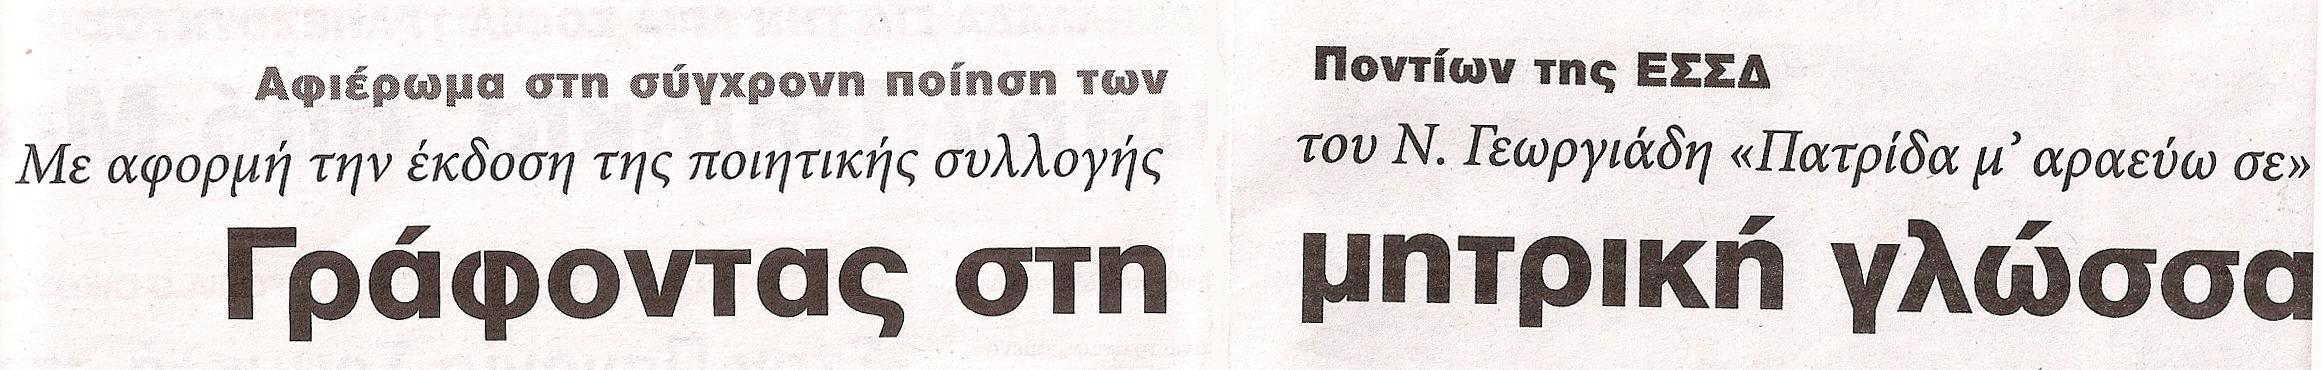 Georgiadis0016